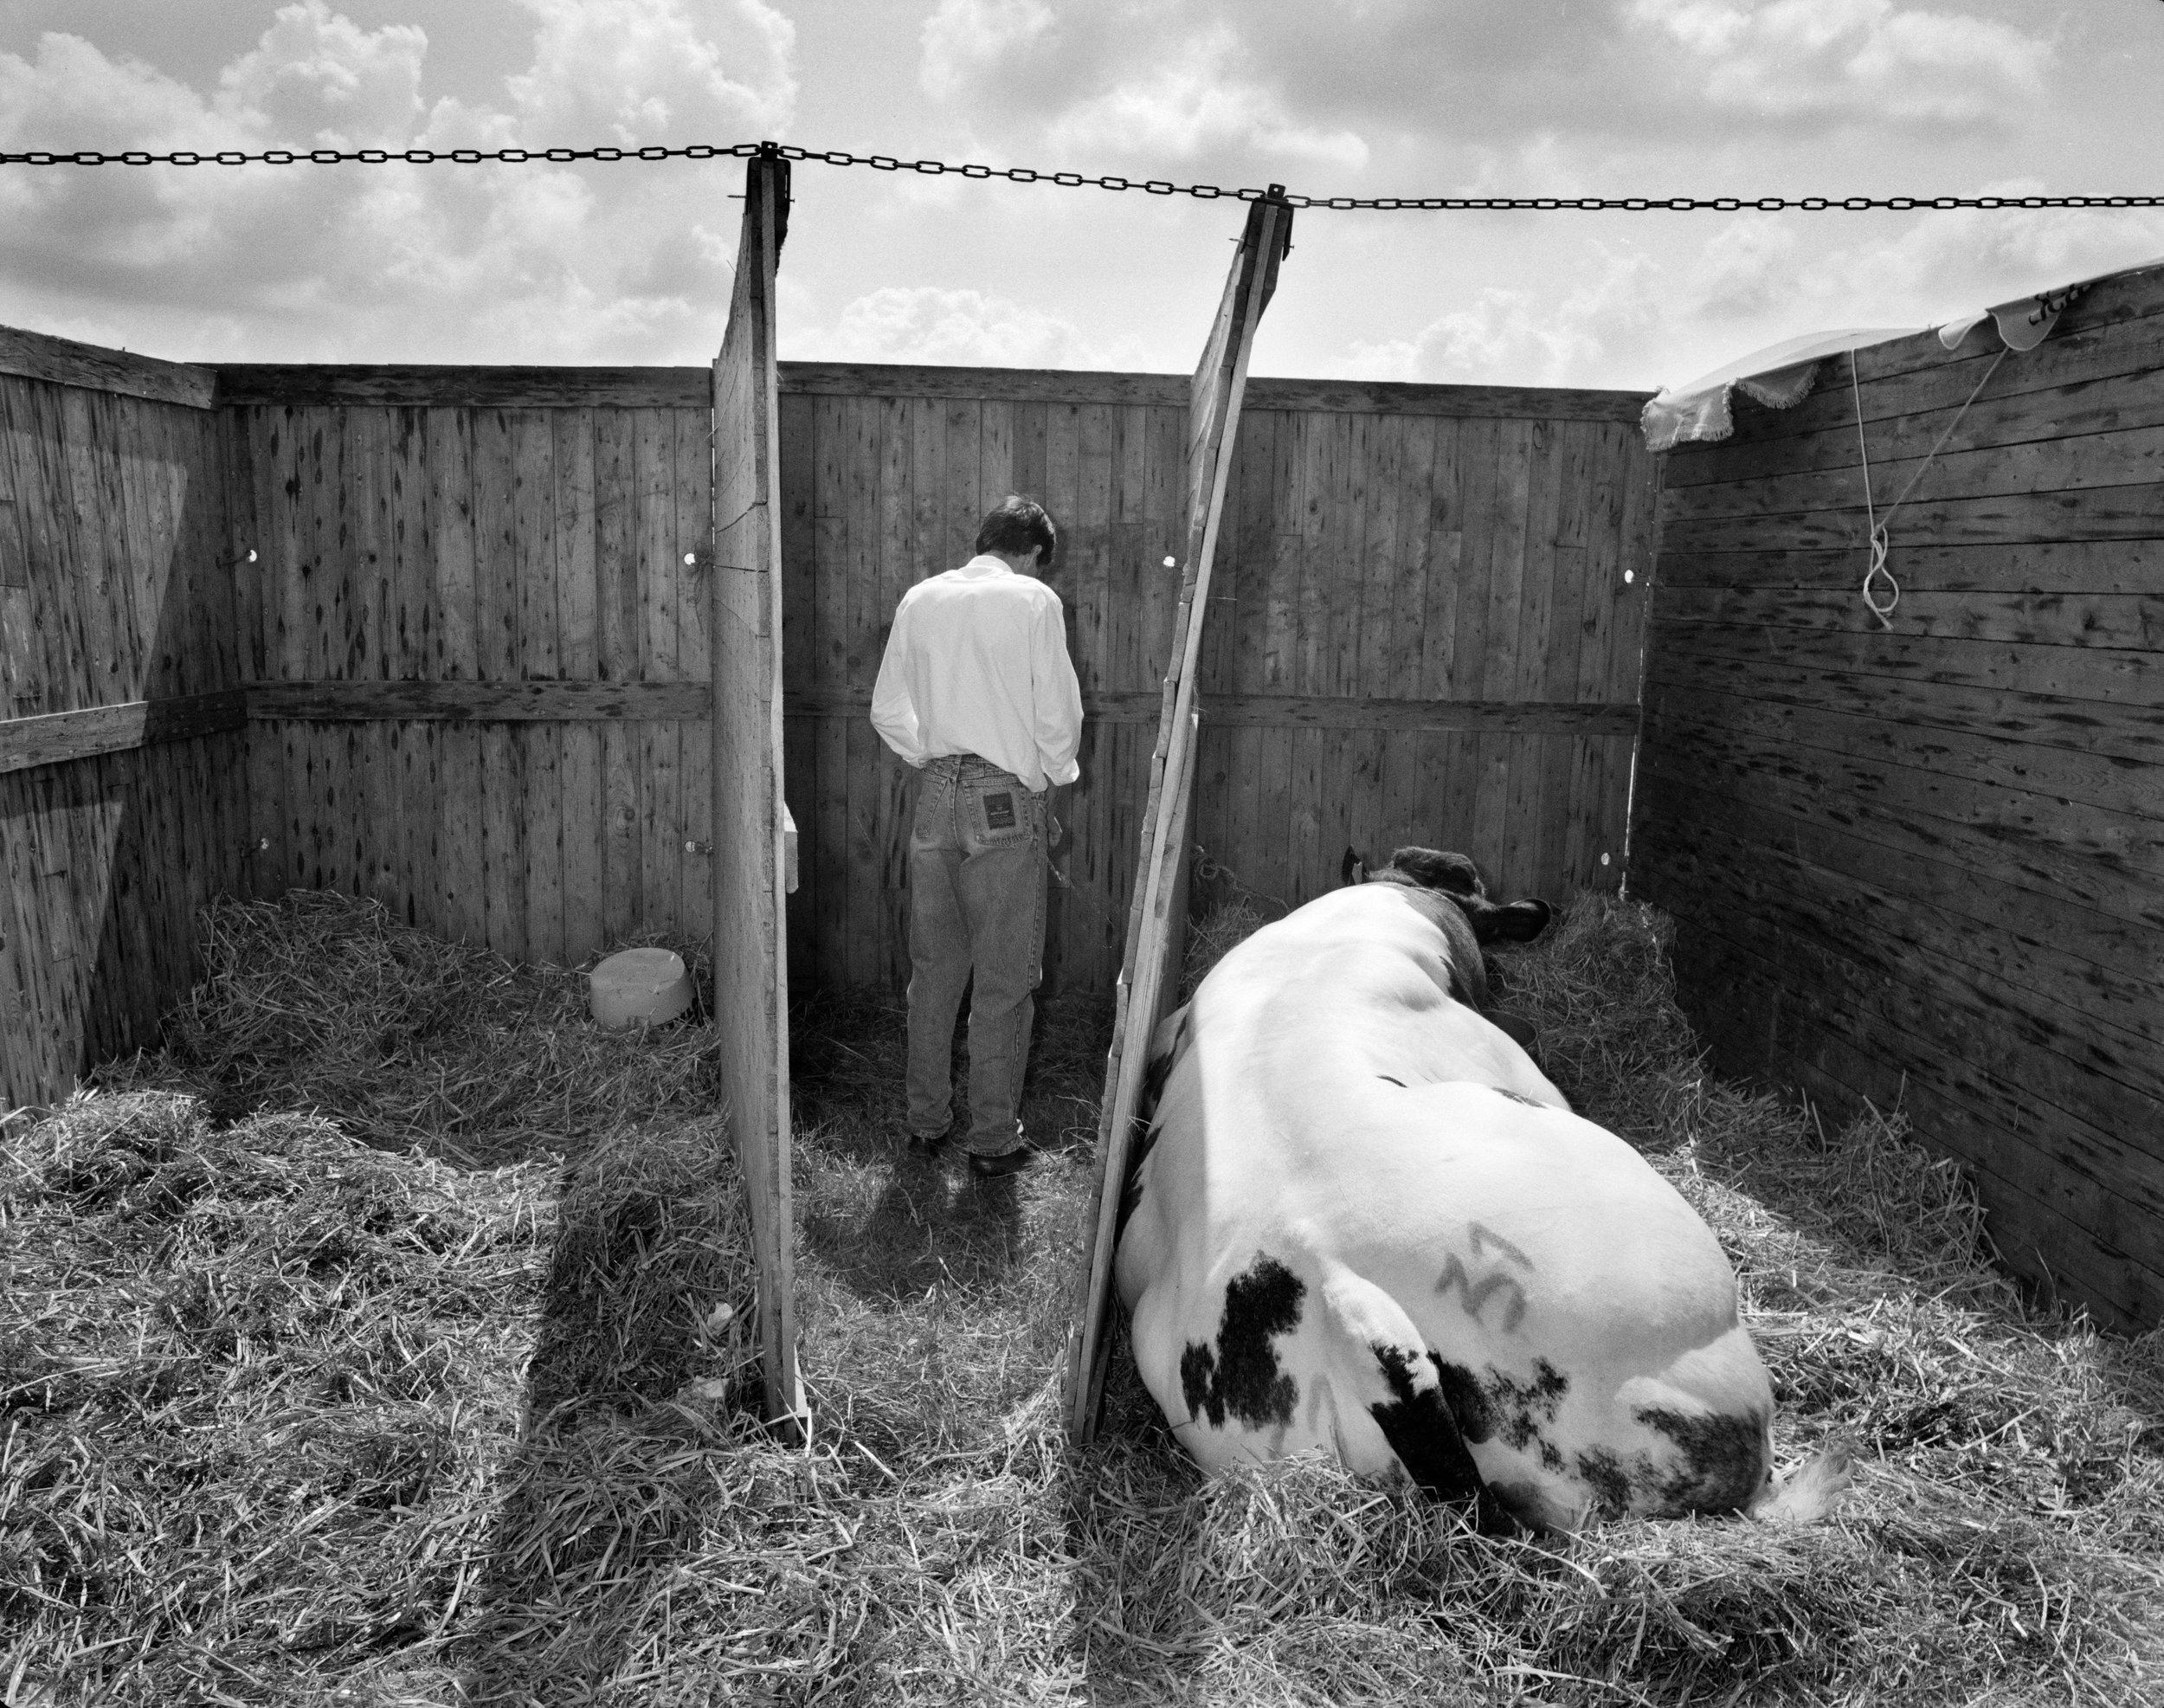 Rural Belgium 1992